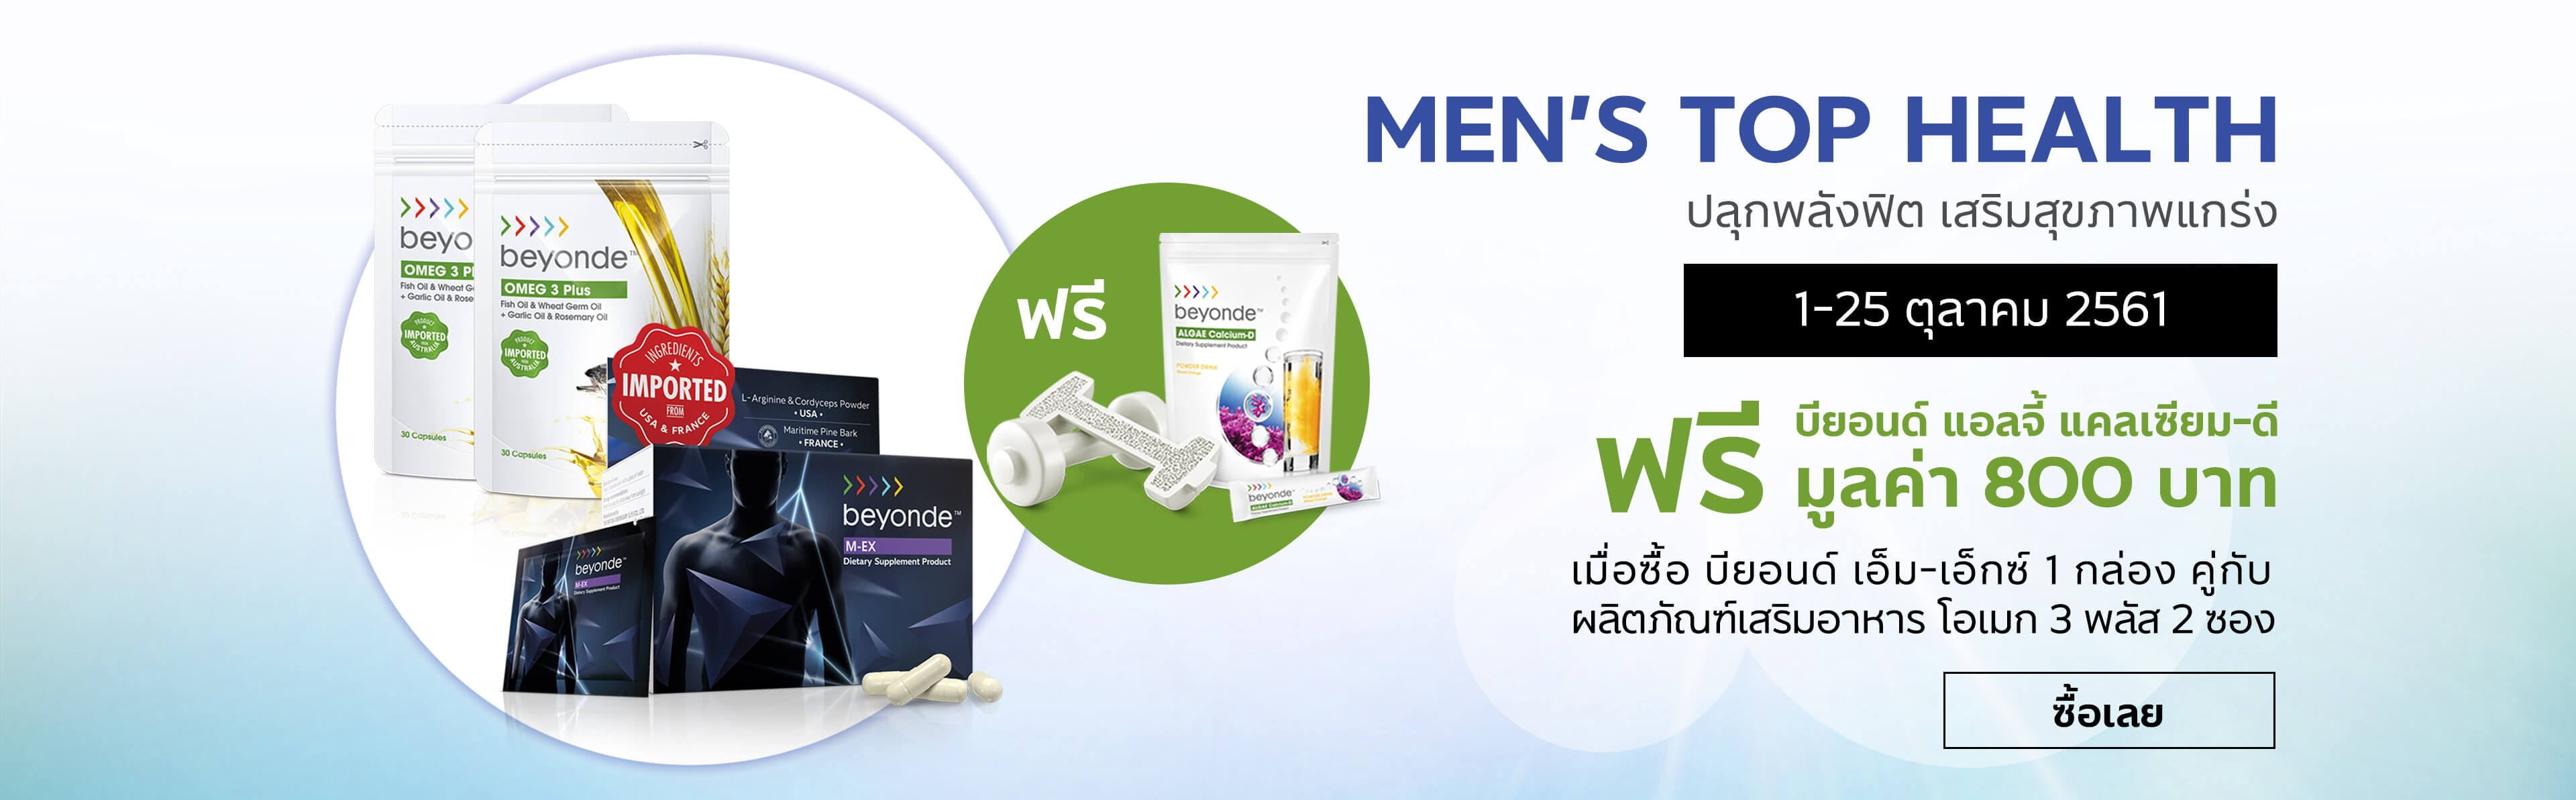 MEN's Top Health Promotion